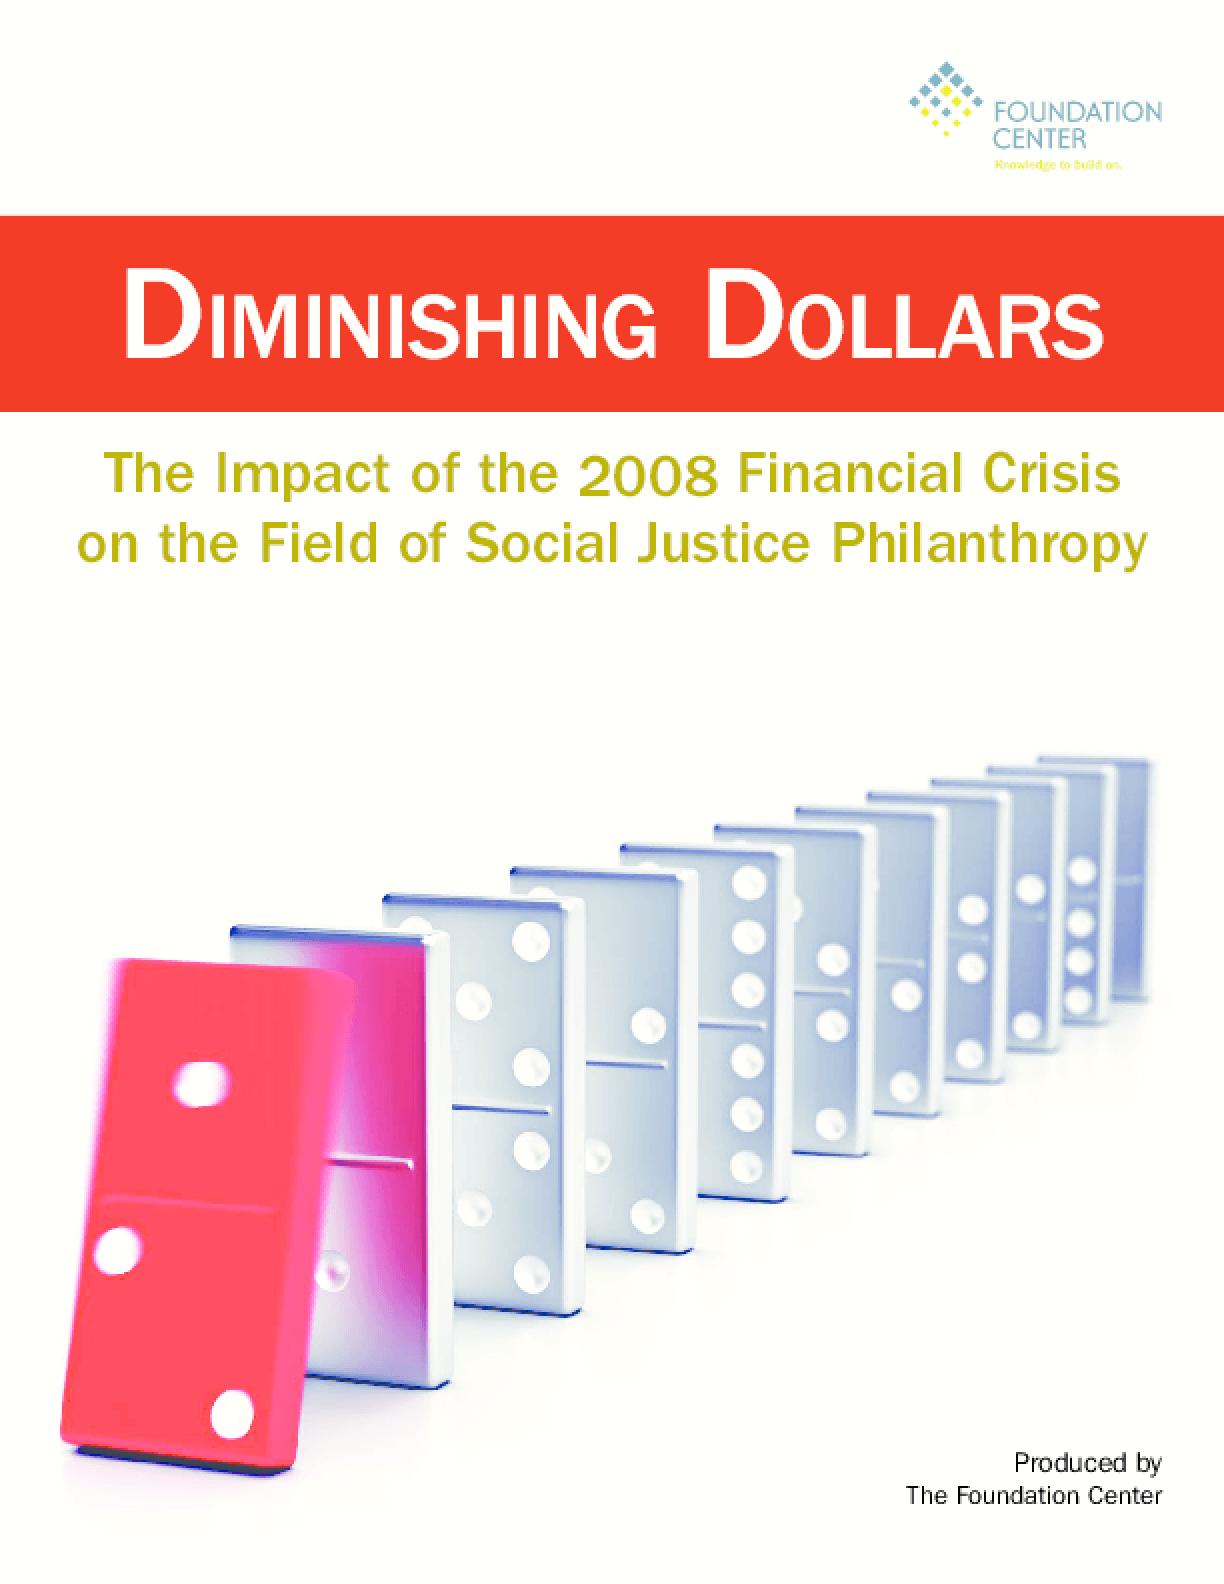 Diminishing Dollars for Social Justice Philanthropy